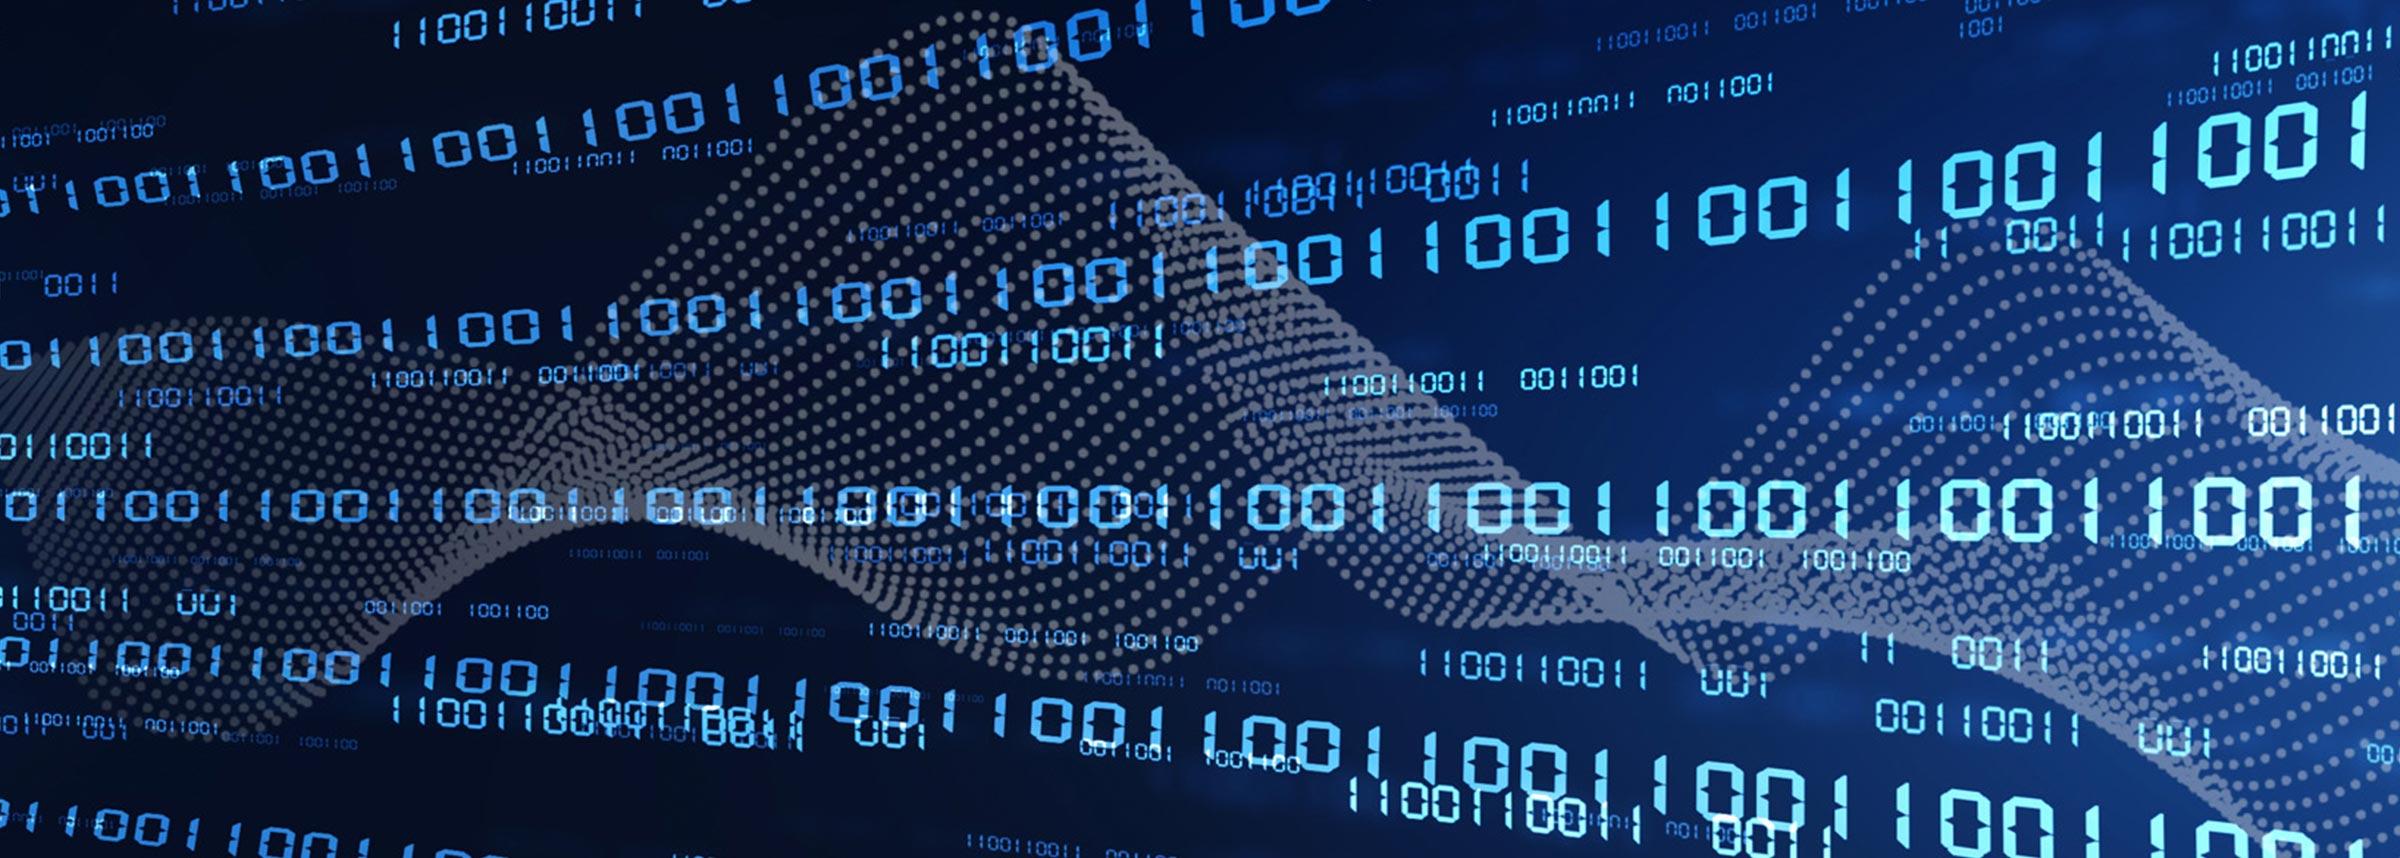 MetricStream Digital Risk Management Solution Demo